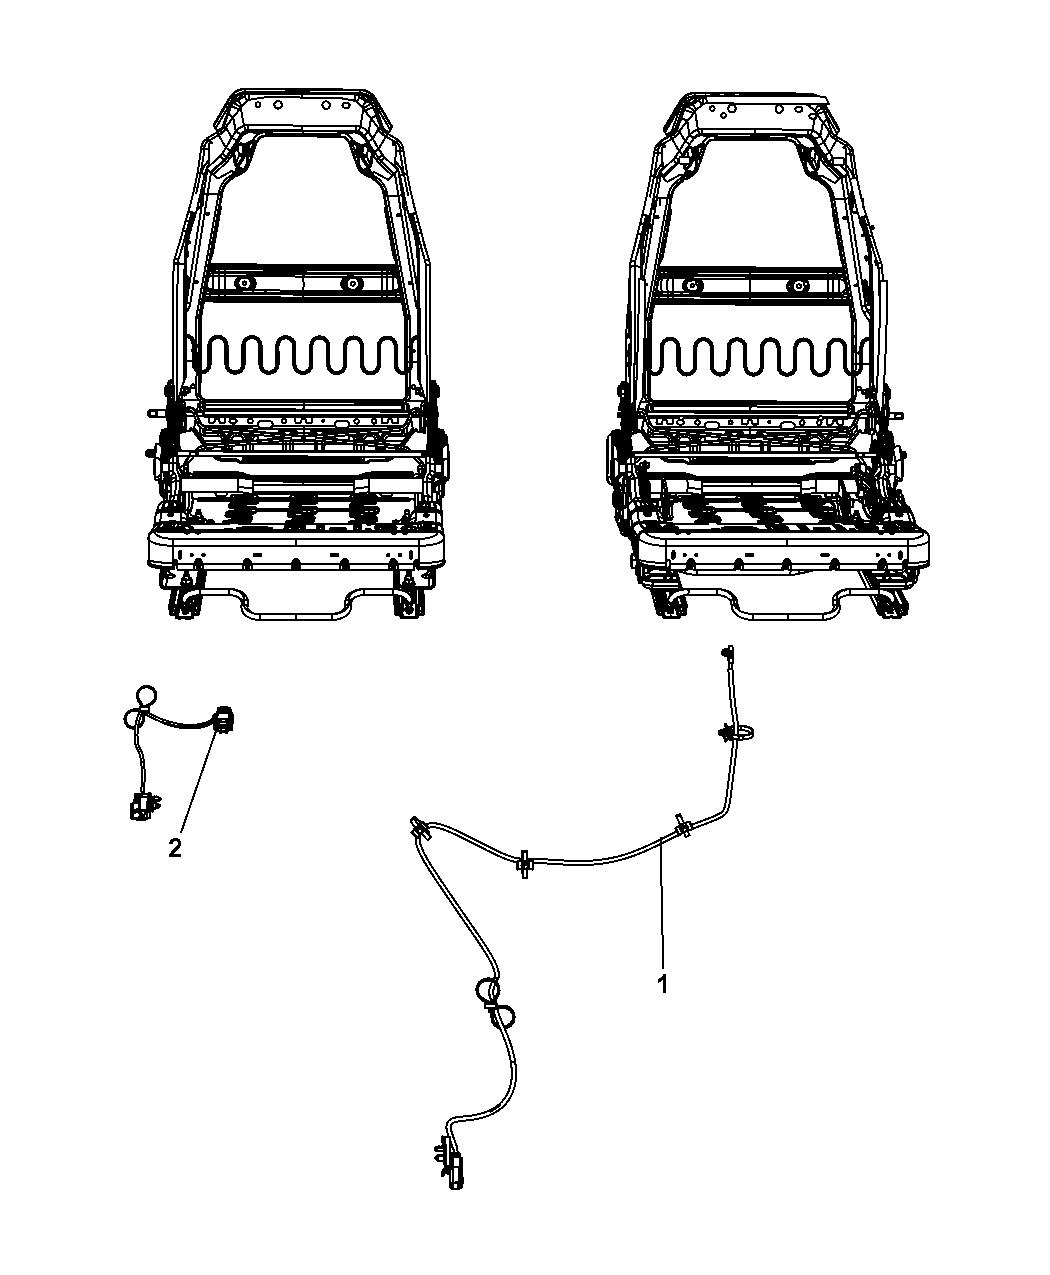 2007 jeep wrangler wiring seats mopar parts giant. Black Bedroom Furniture Sets. Home Design Ideas